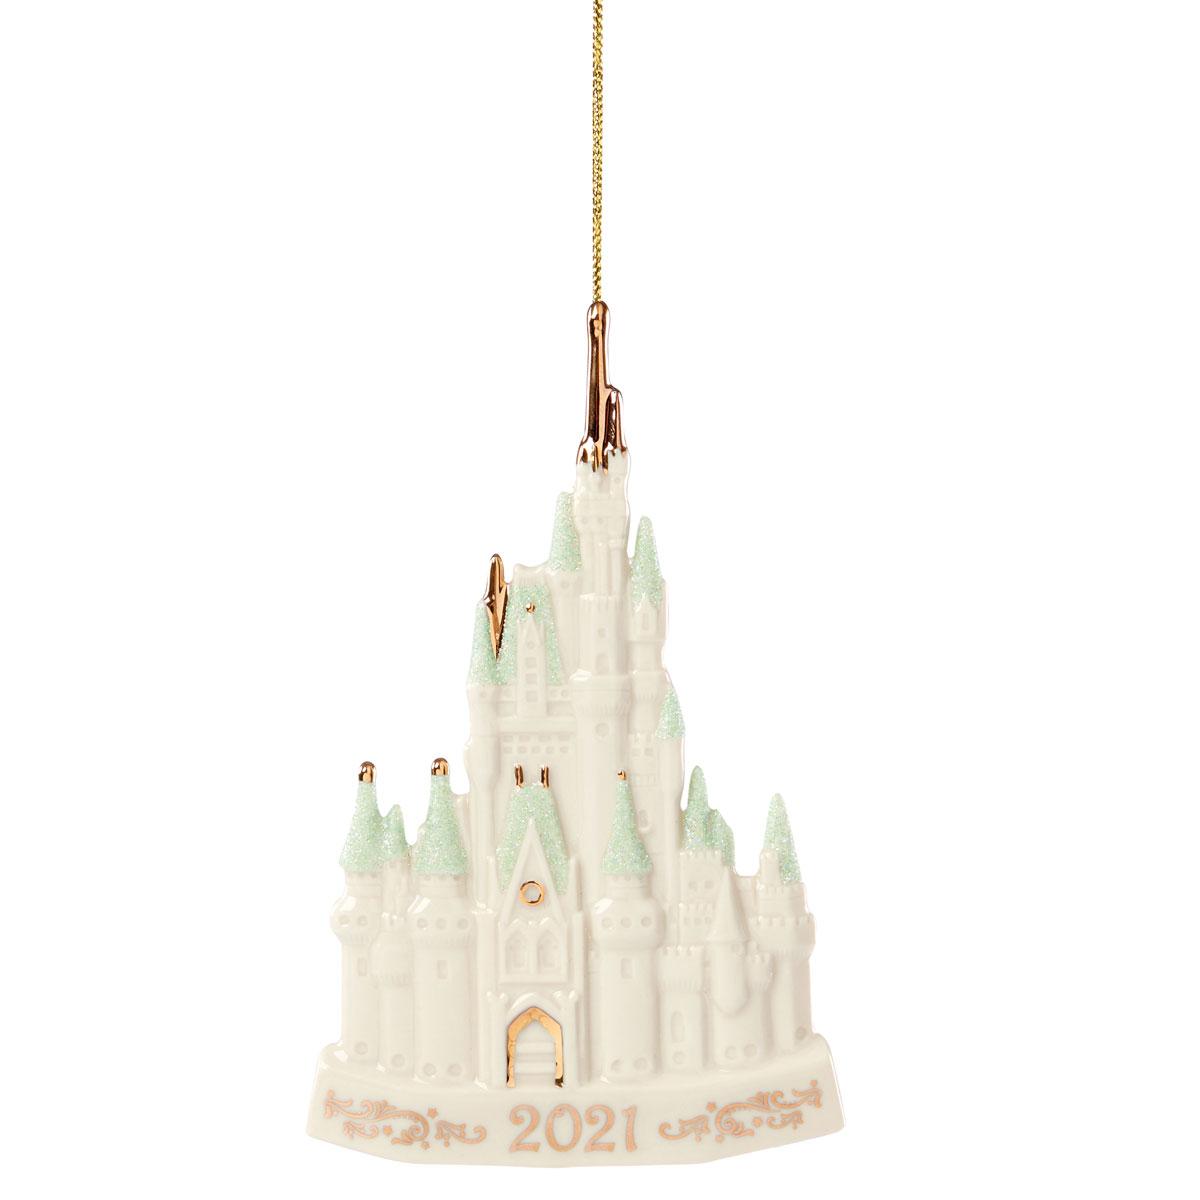 Lenox 2021 Disney 2021 Cinderella Castle Dated Ornament